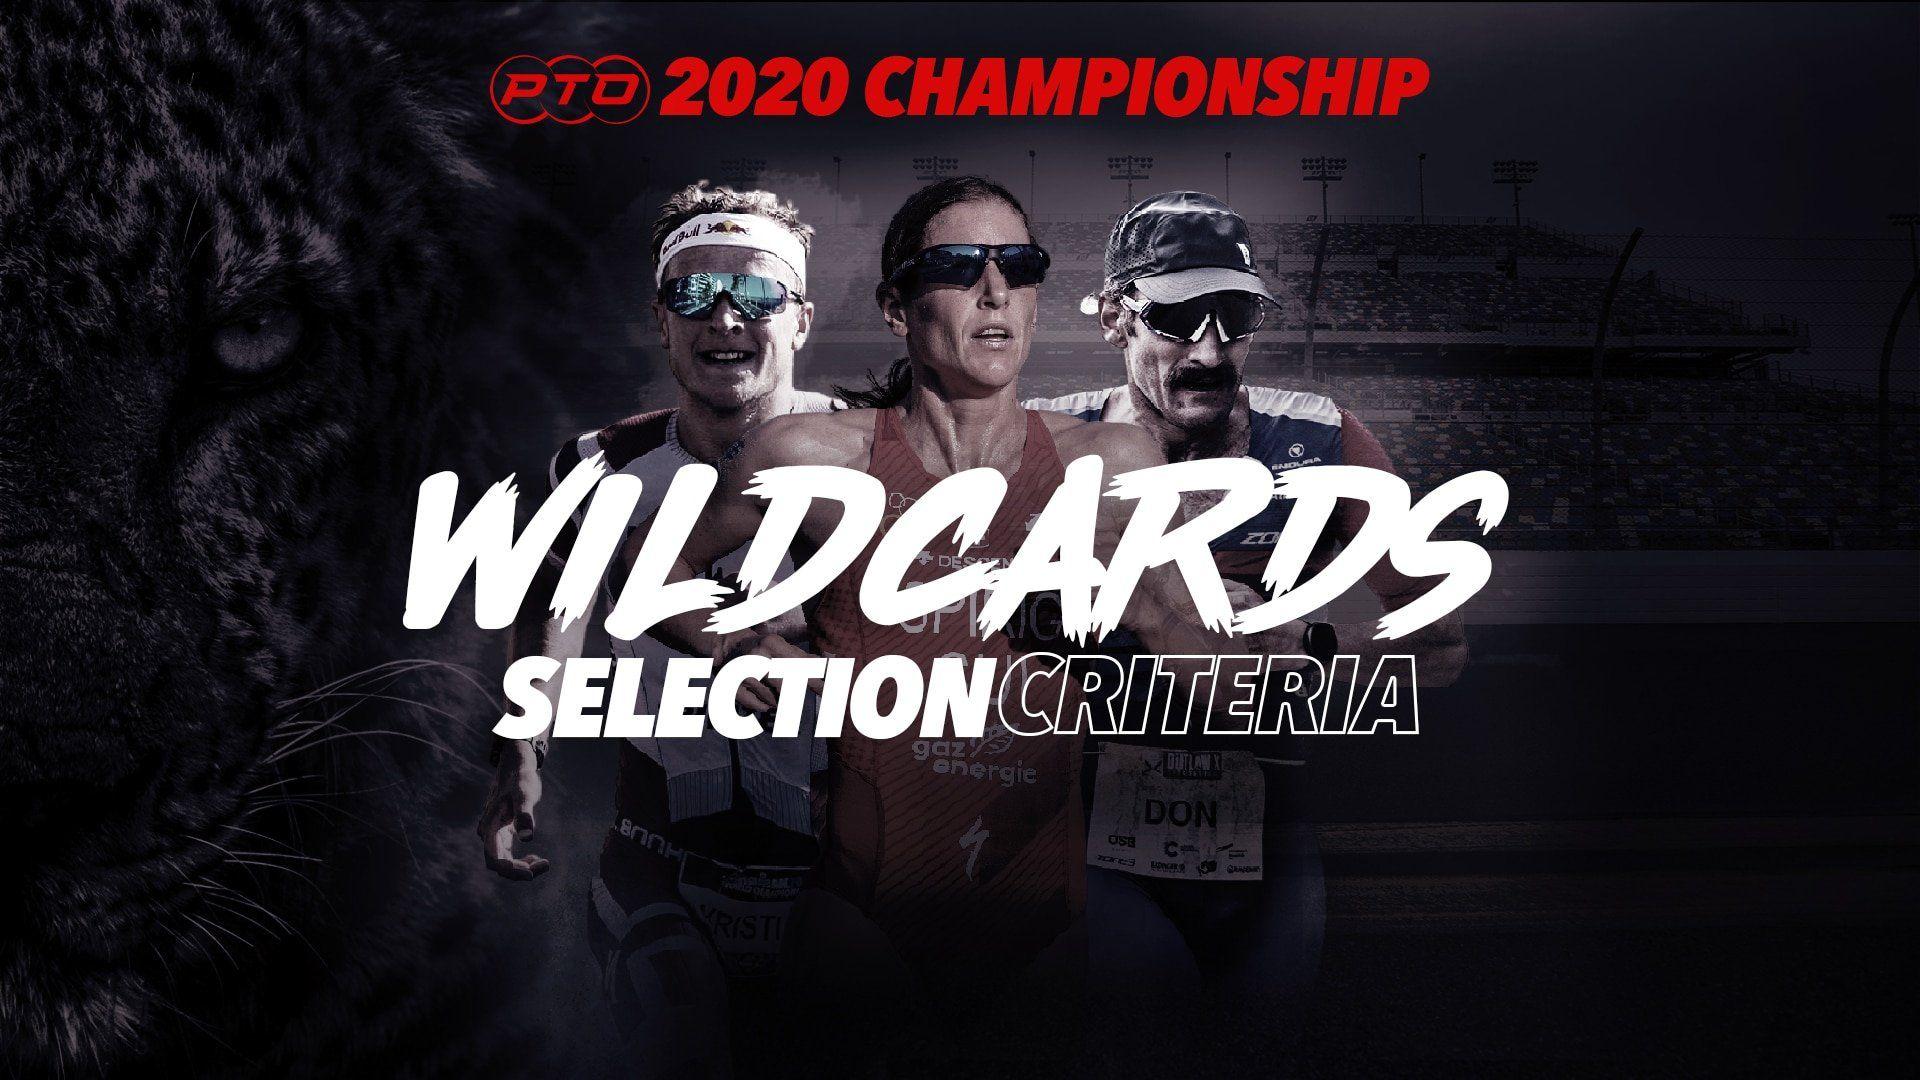 Wildcard Selection Criteria